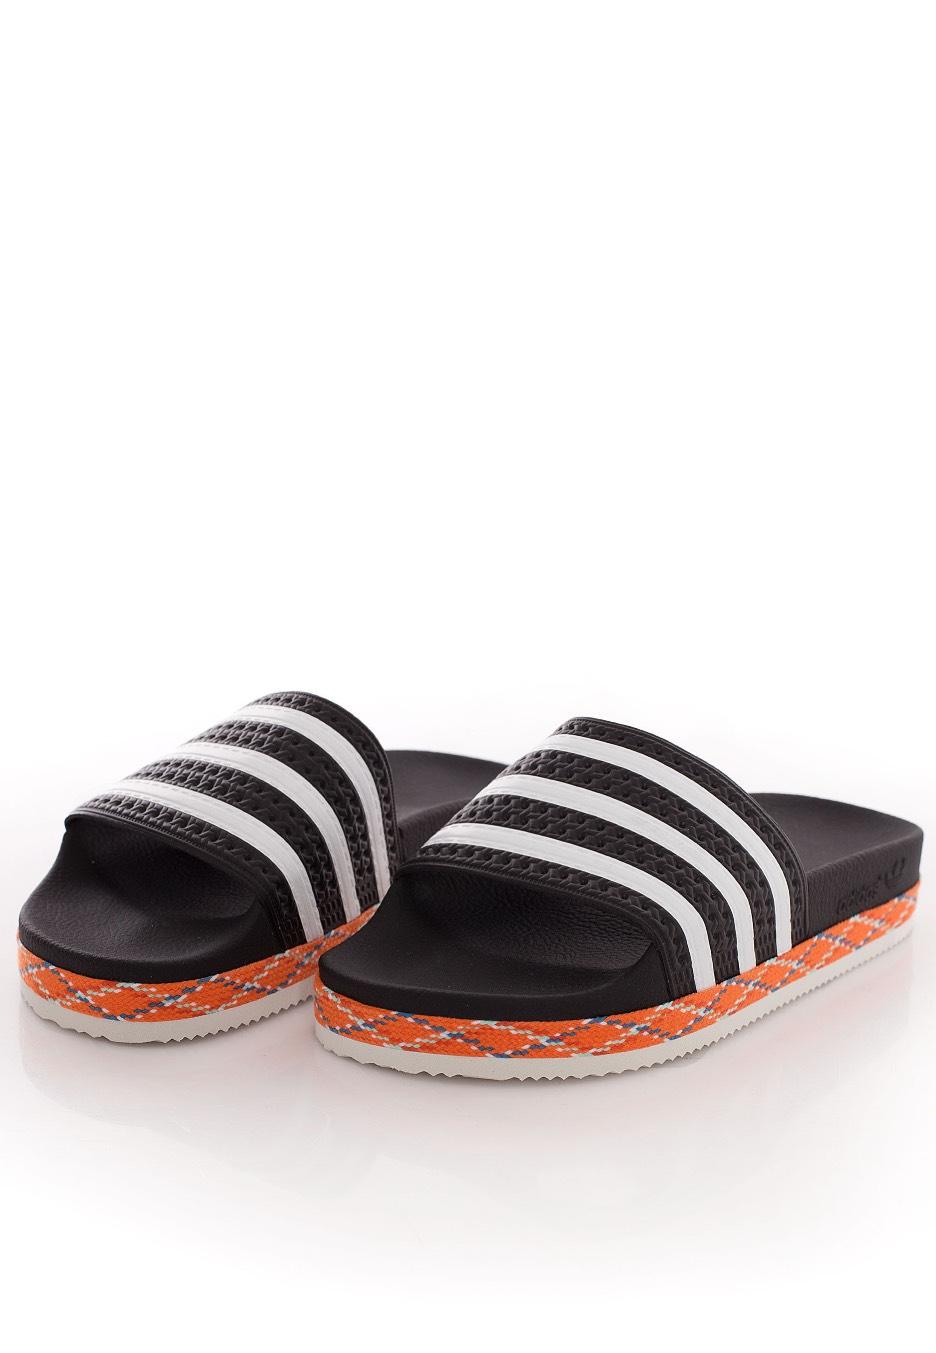 9b262b439a1f36 ... Adidas - Adilette New Bold Core Black White Core Black - Girl Sandals  ...